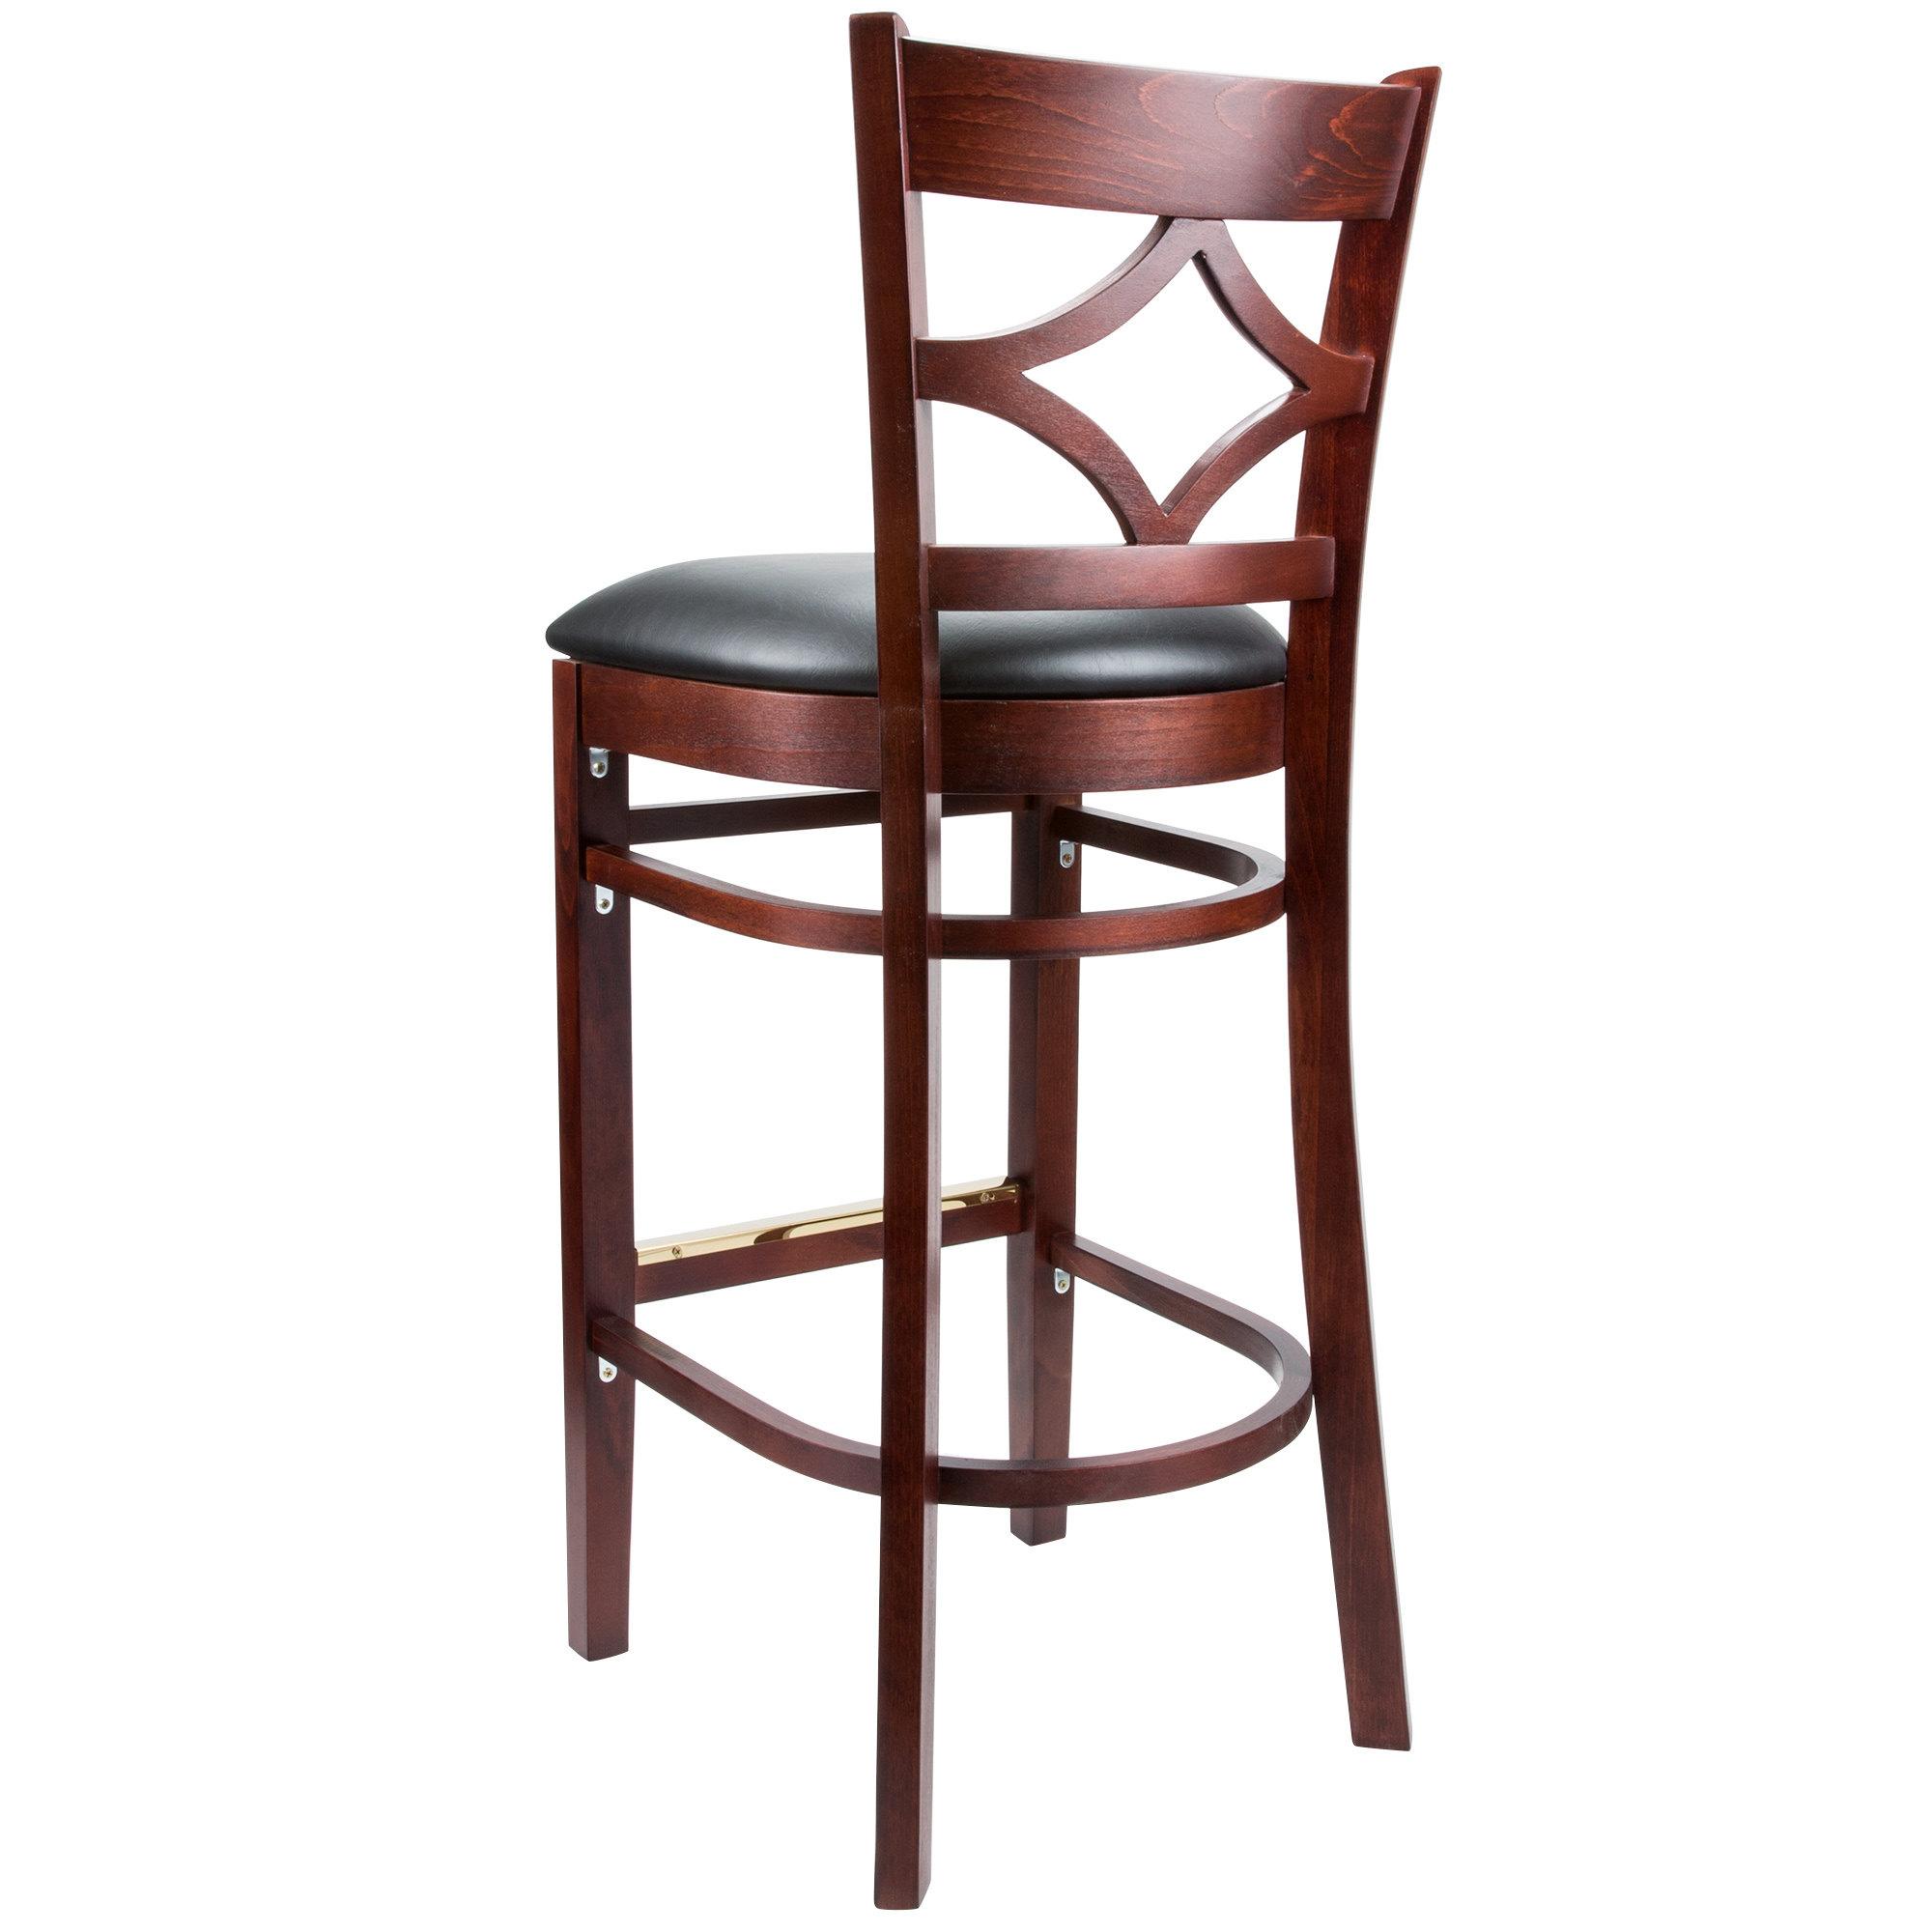 #103 - Mahogany Wood Finished Diamond Back Restaurant Barstool with Black Vinyl Seat